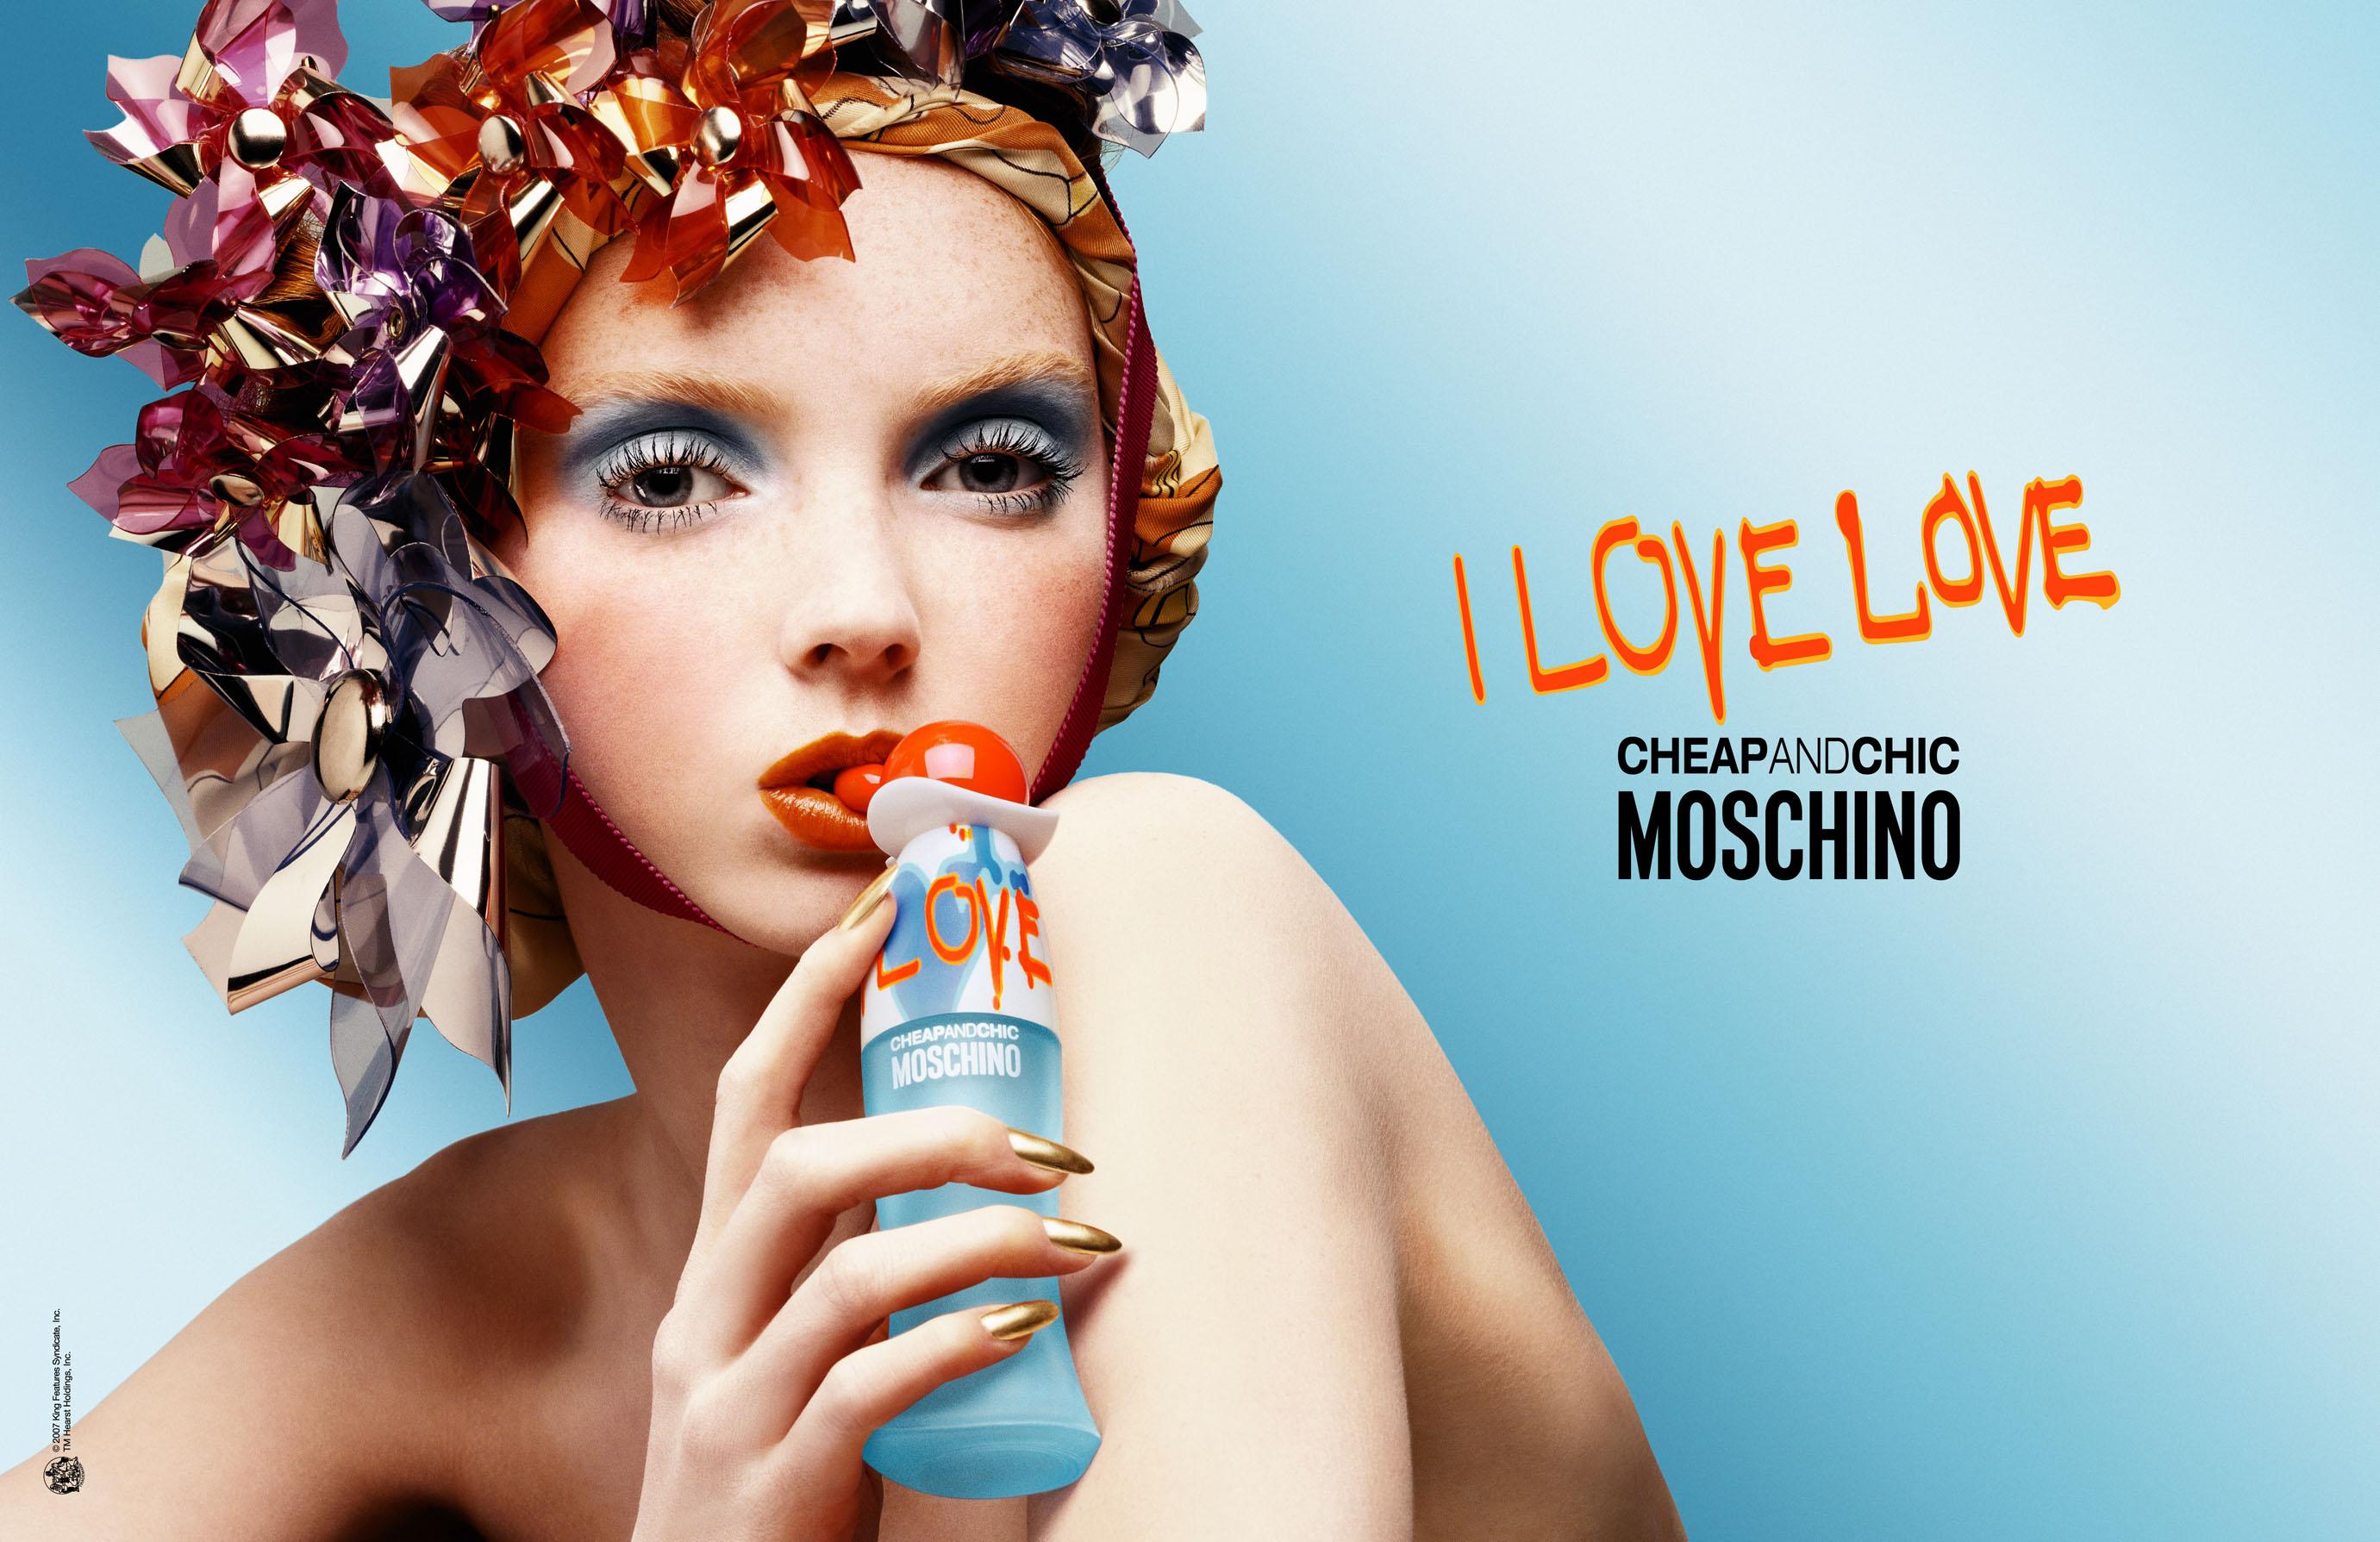 I LOVE LOVE – CHEAP & CHIC – MOSCHINO   GEURENGOEROE